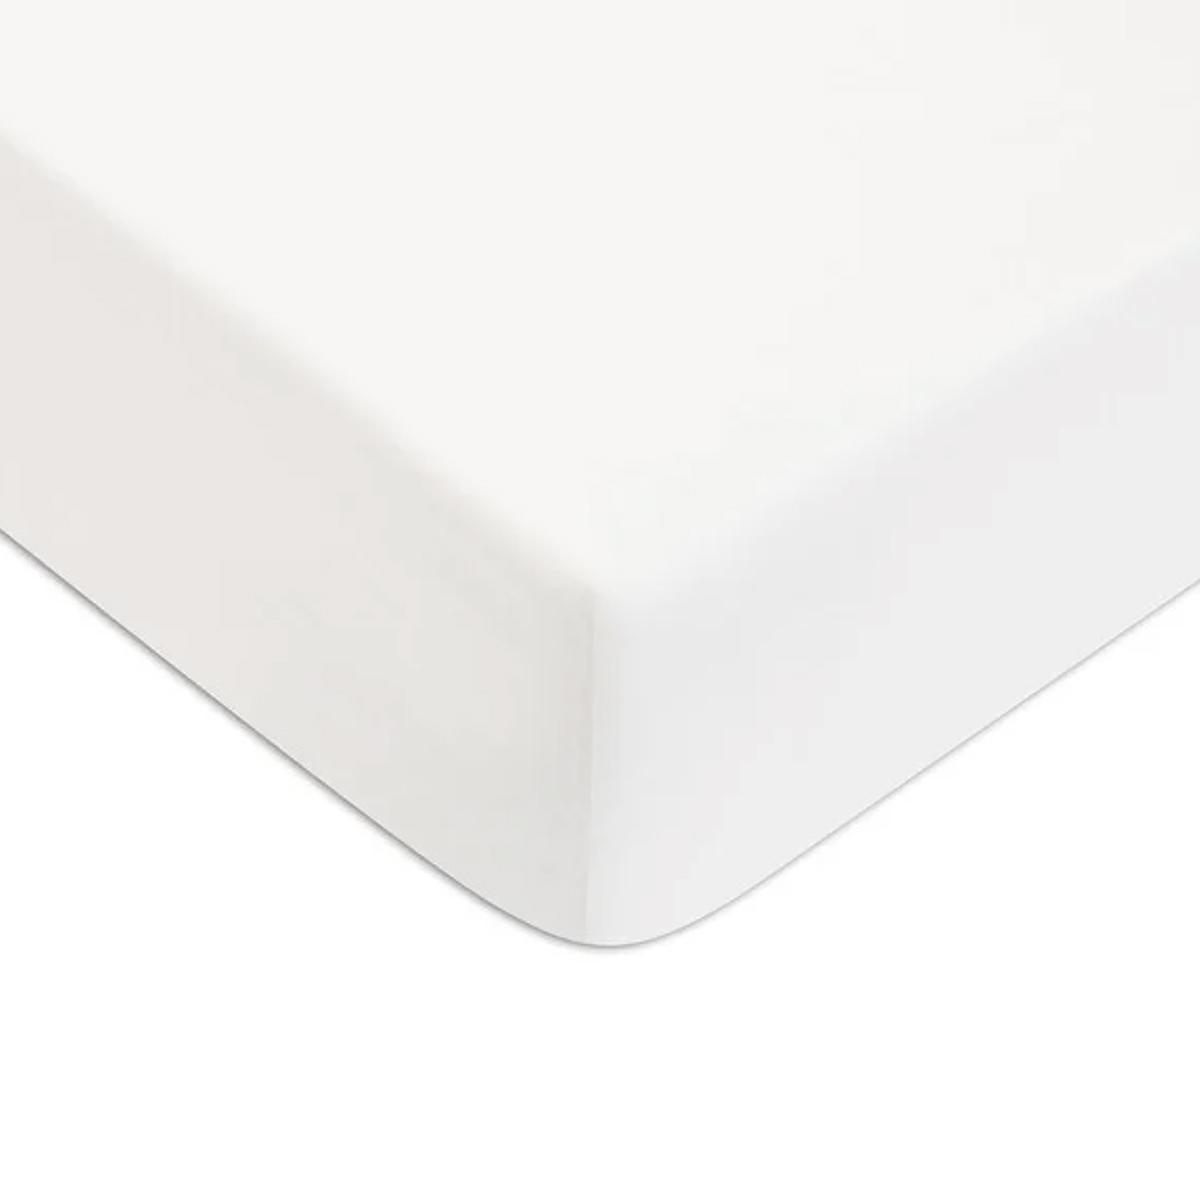 Drap housse Blanc 90x200cm 57 fils